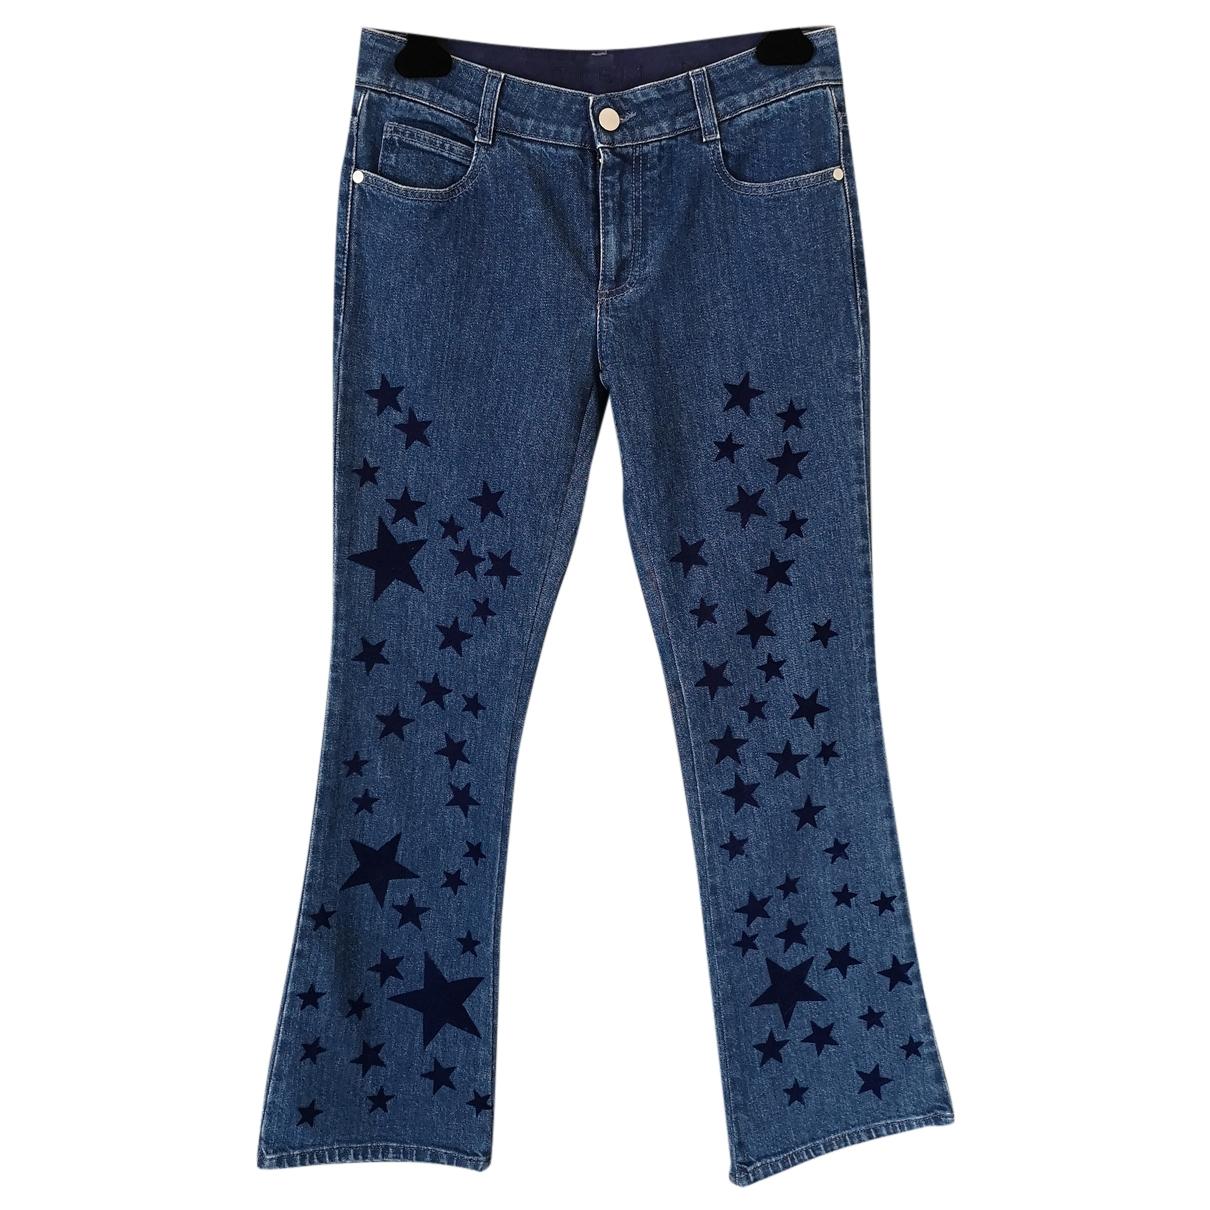 Stella Mccartney \N Blue Cotton - elasthane Jeans for Women 26 US